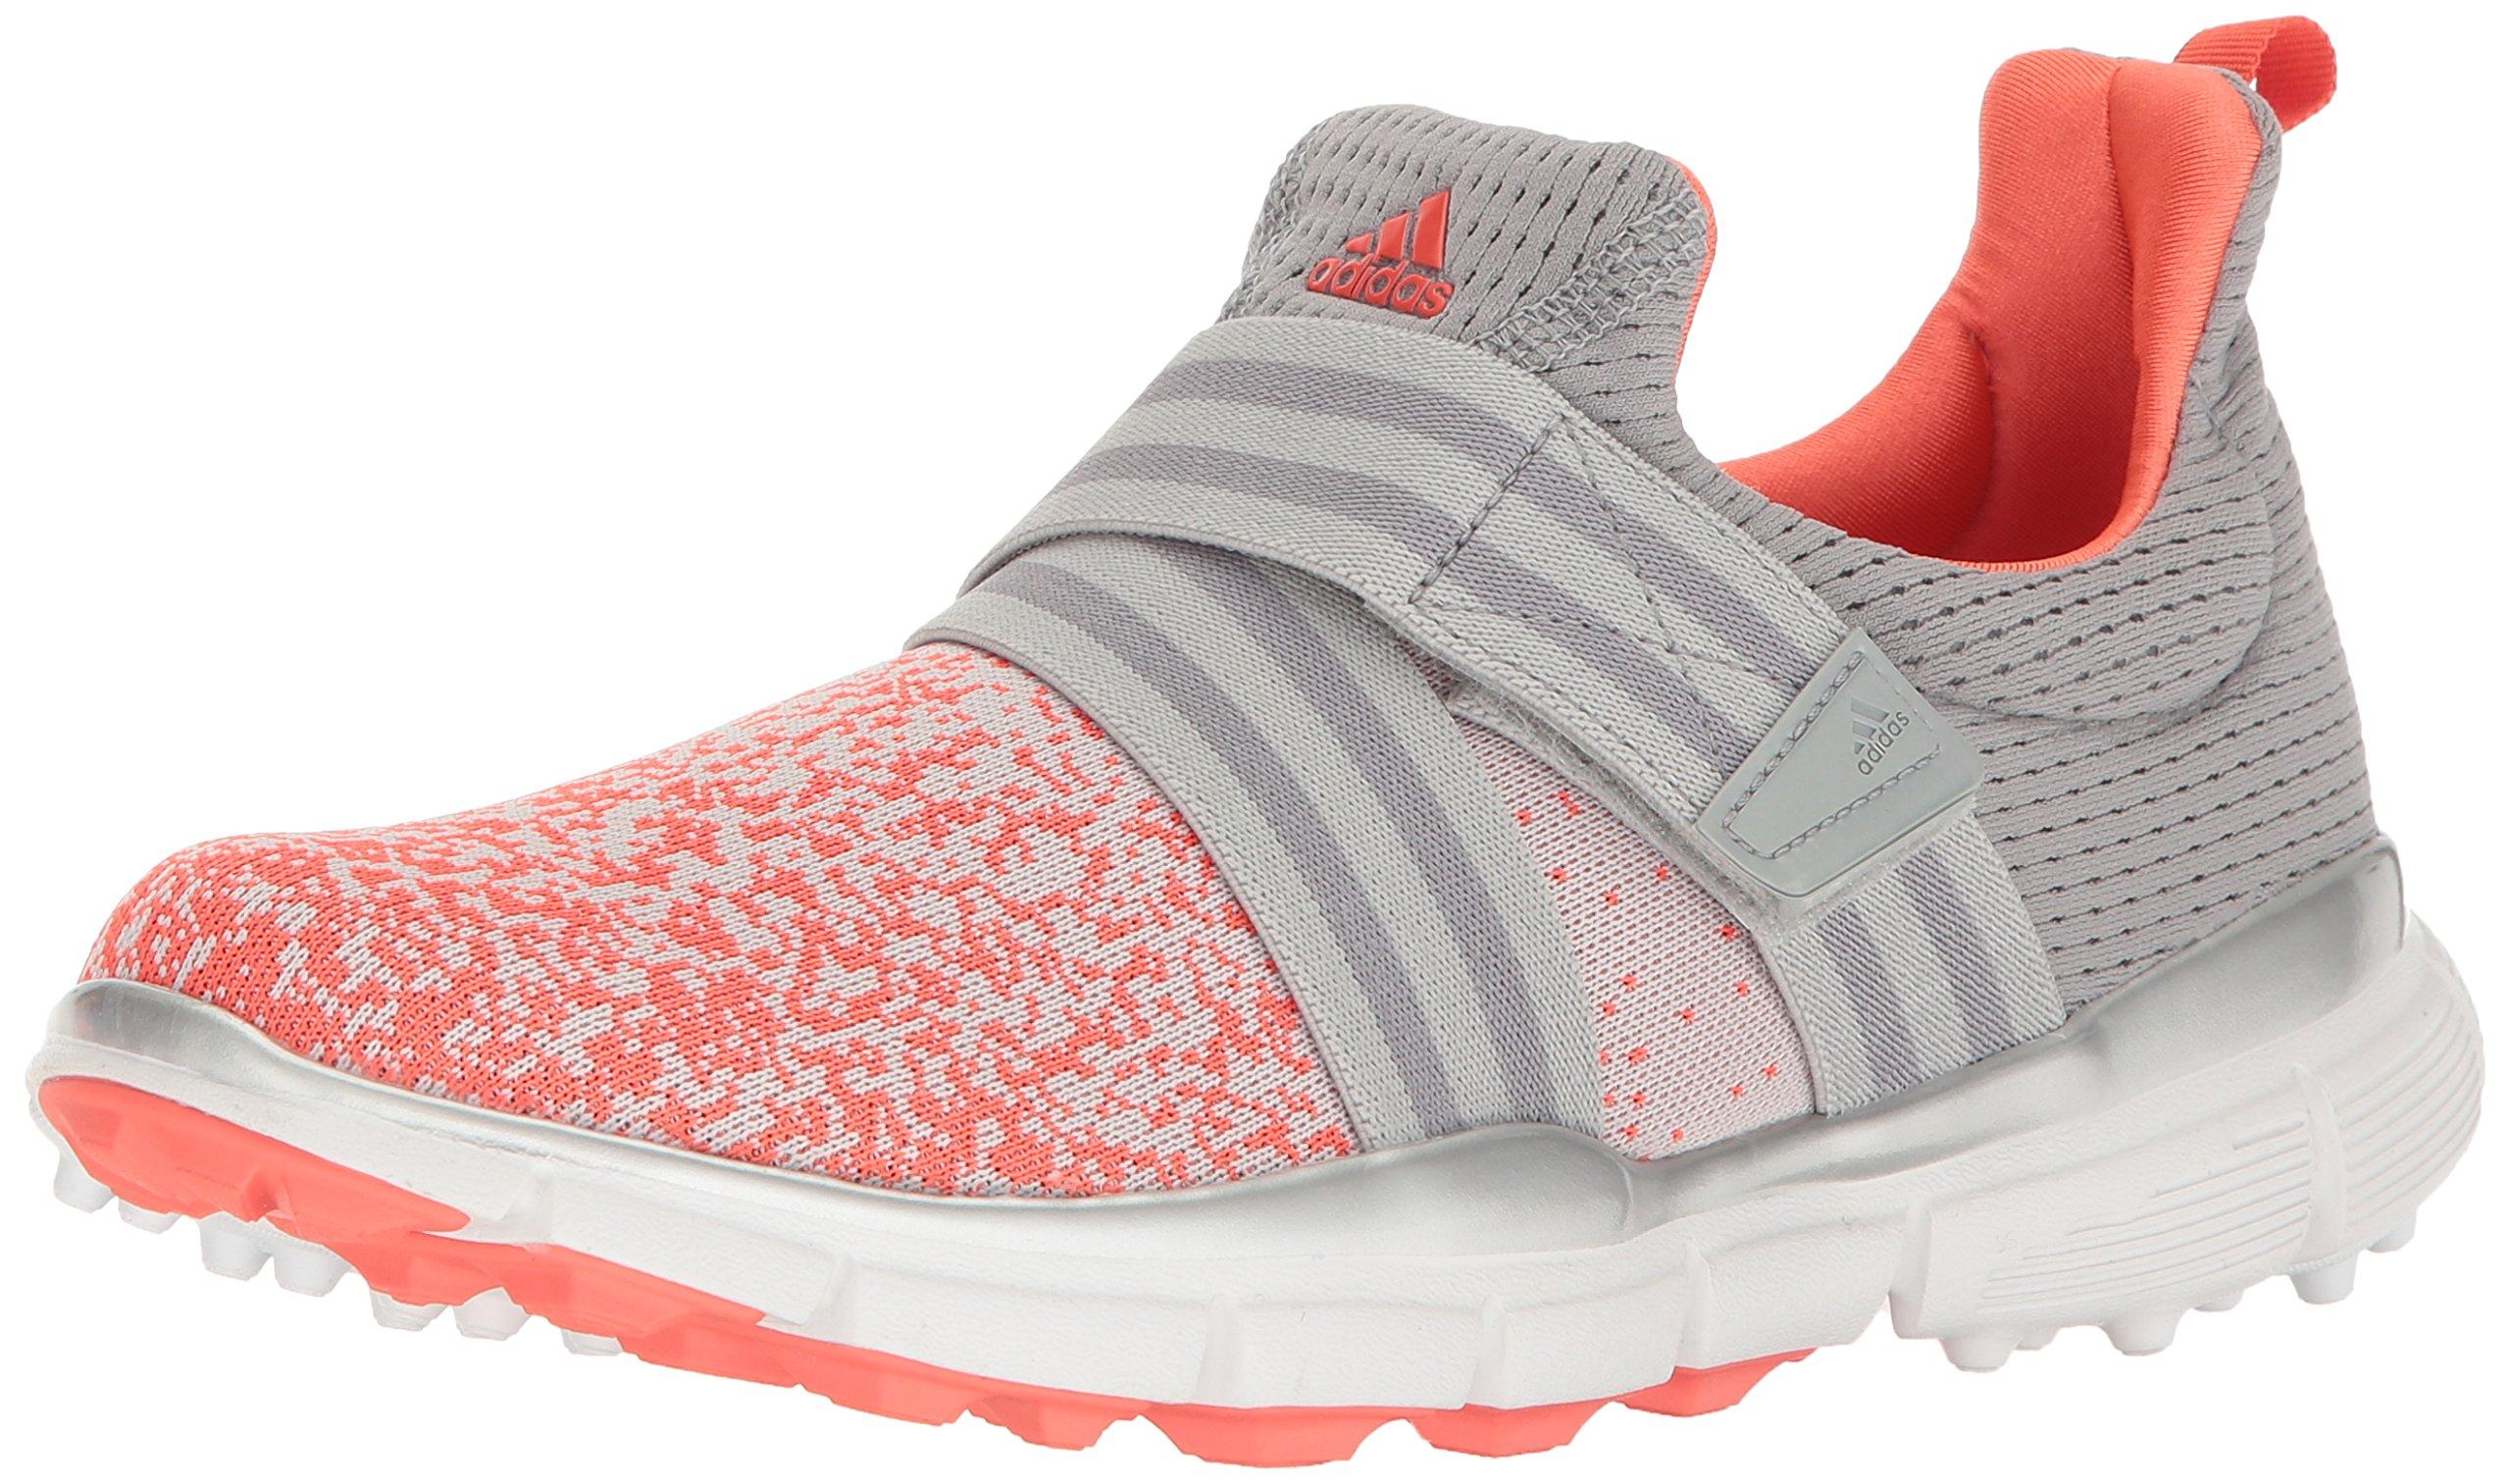 adidas Women's Climacool Knit Golf Shoe, Light Onix, 5.5 M US